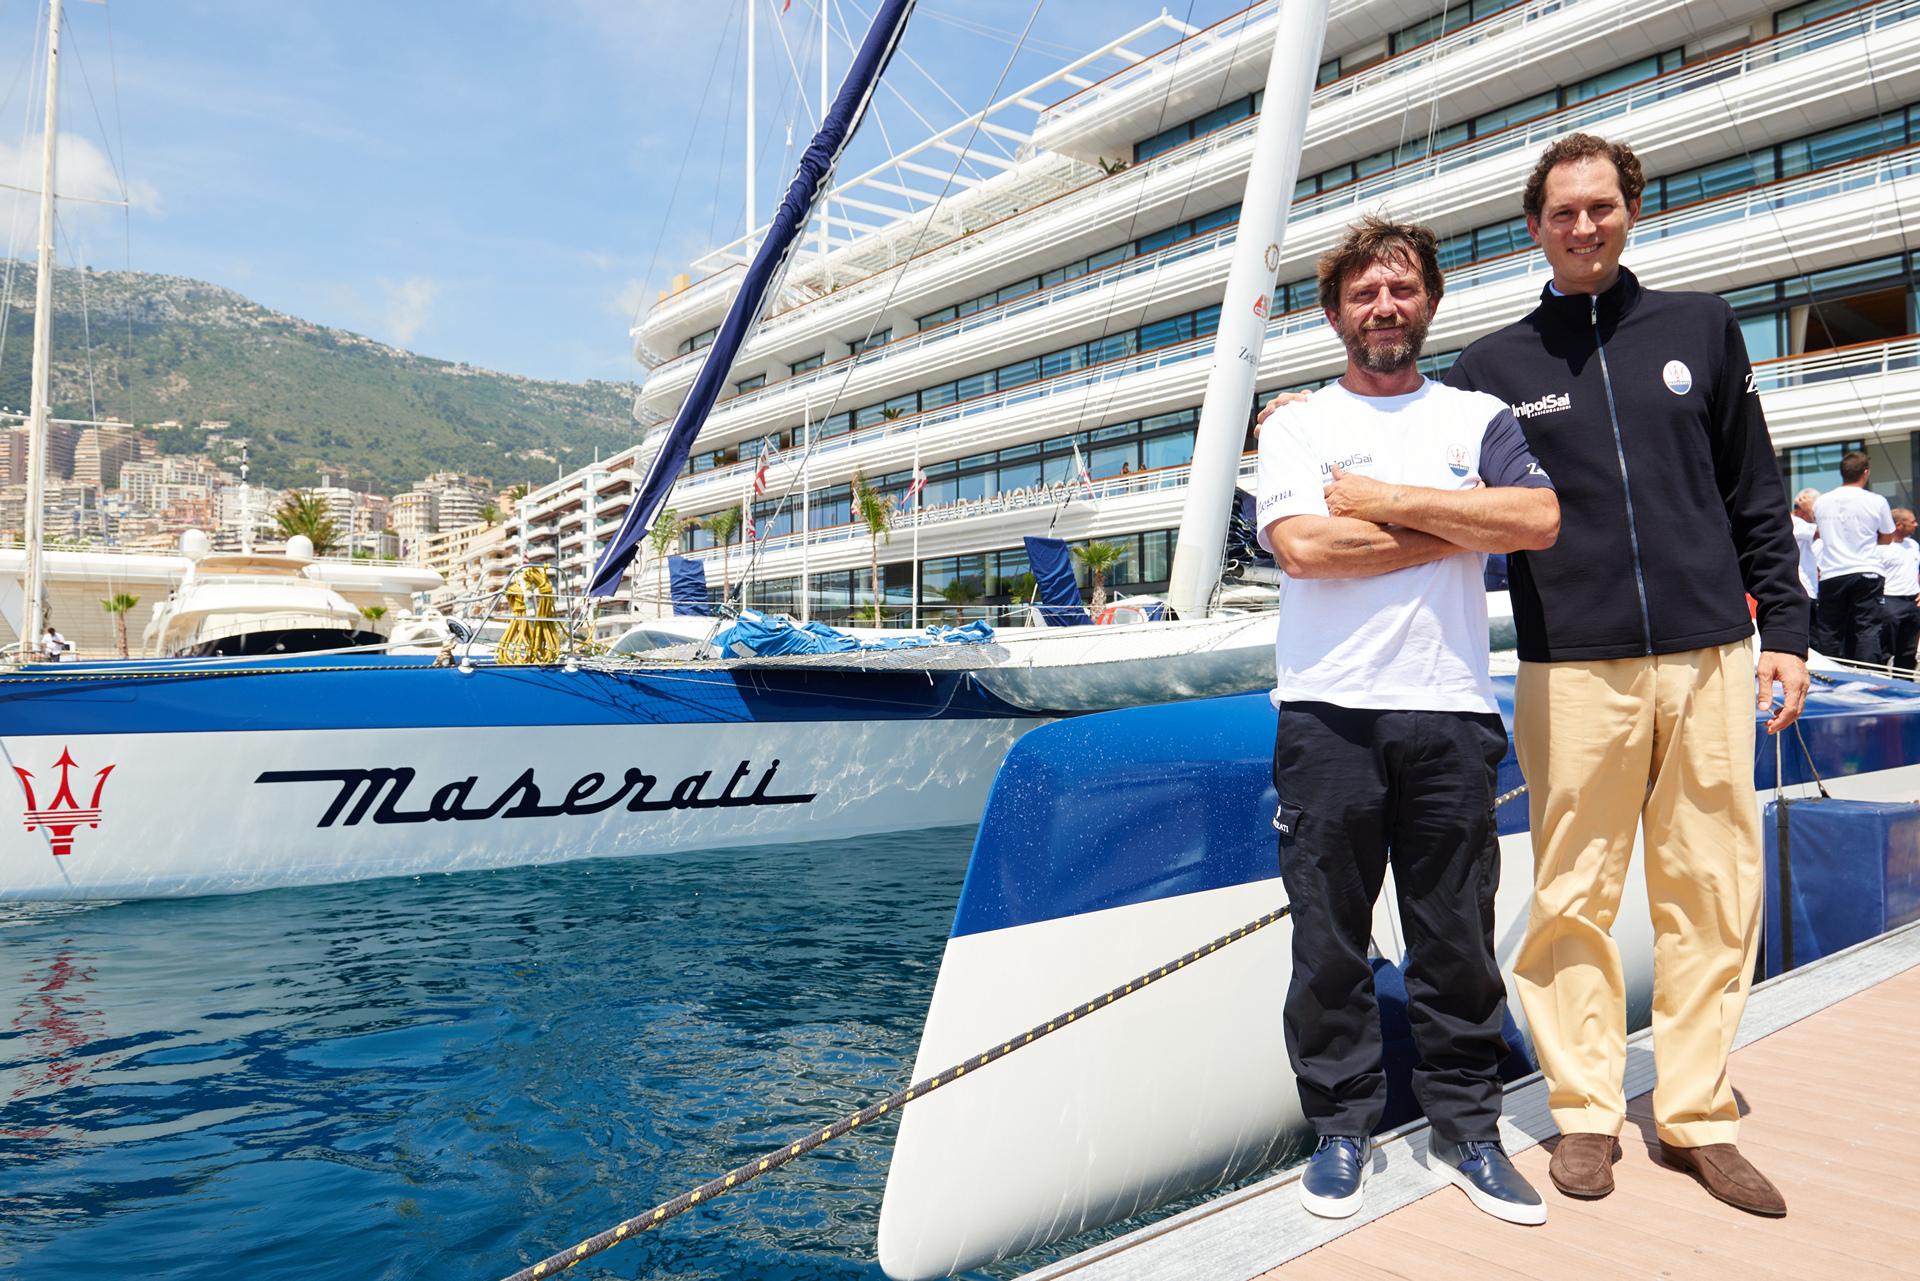 Maserati Multi70 Press Conference @Yacht Club de Monaco, Giovanni Soldini, John Elkann © Fiat Chrysler Automobiles N.V.